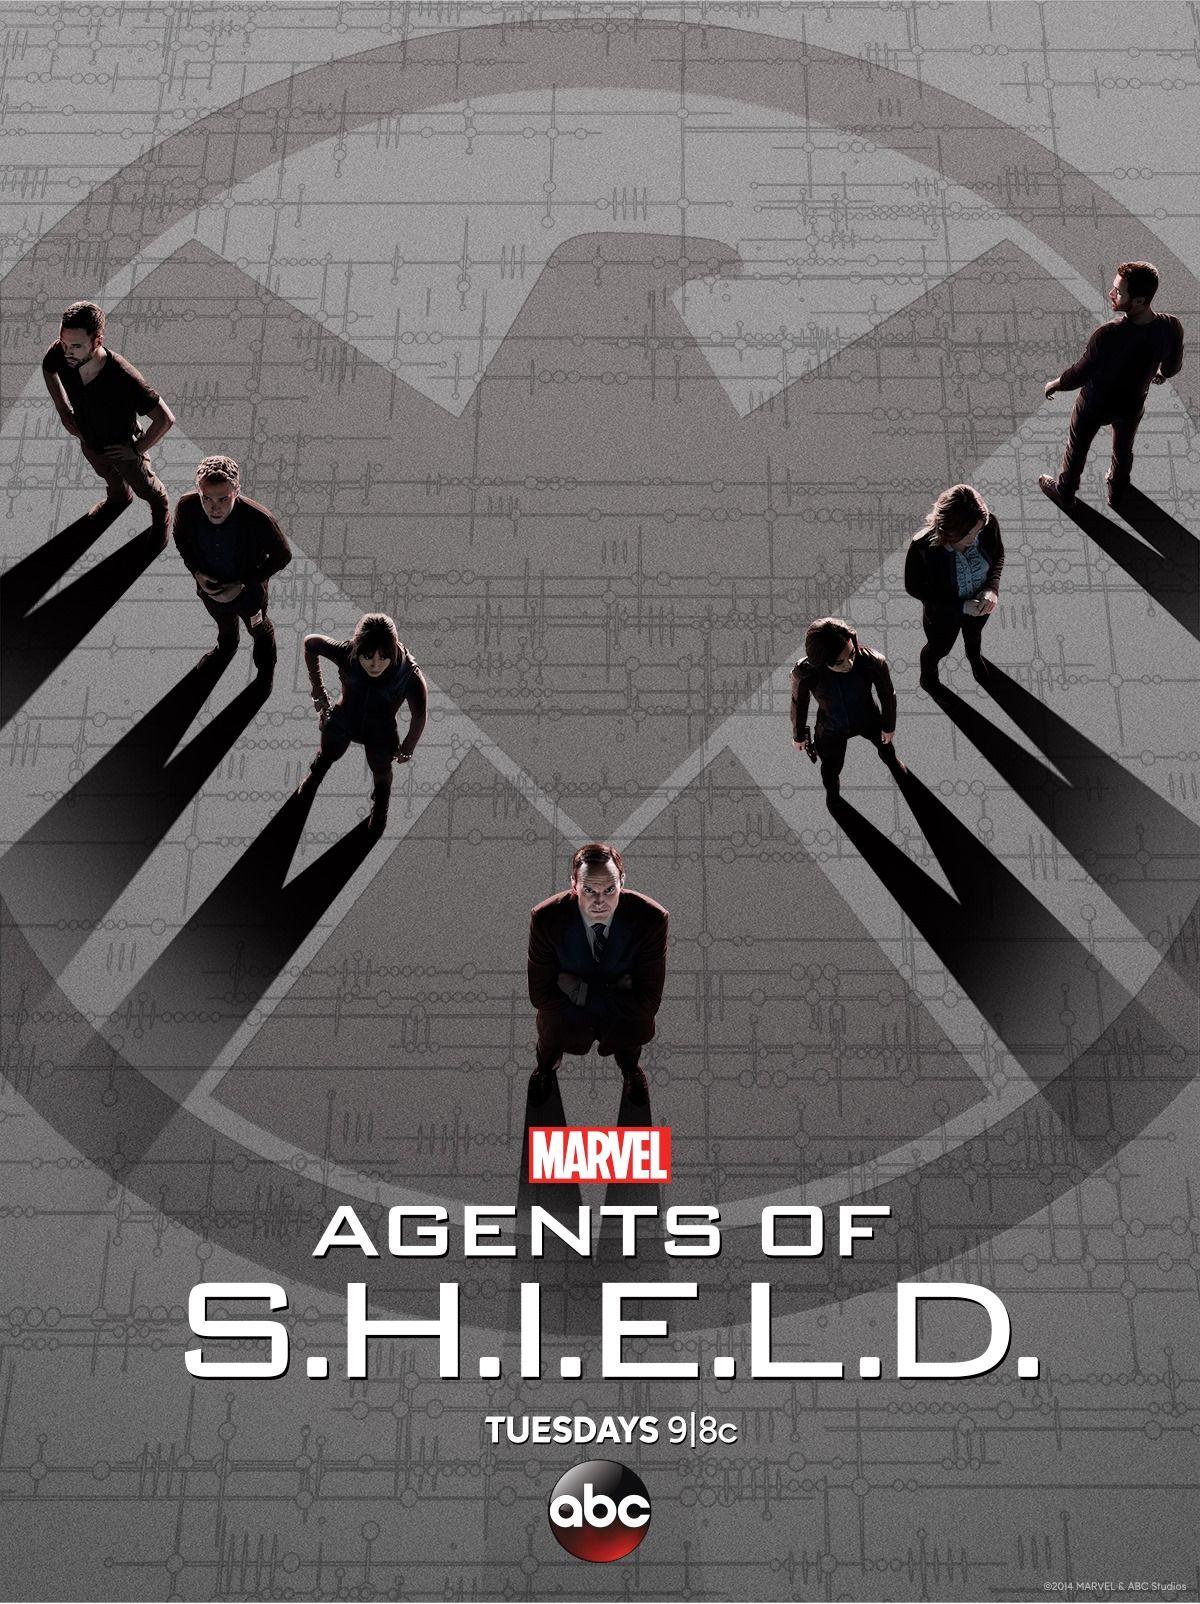 Pin By Lyandra Medeiros On Marvel Comics Stuff Agents Of Shield Marvel Agents Of Shield Marvels Agents Of Shield